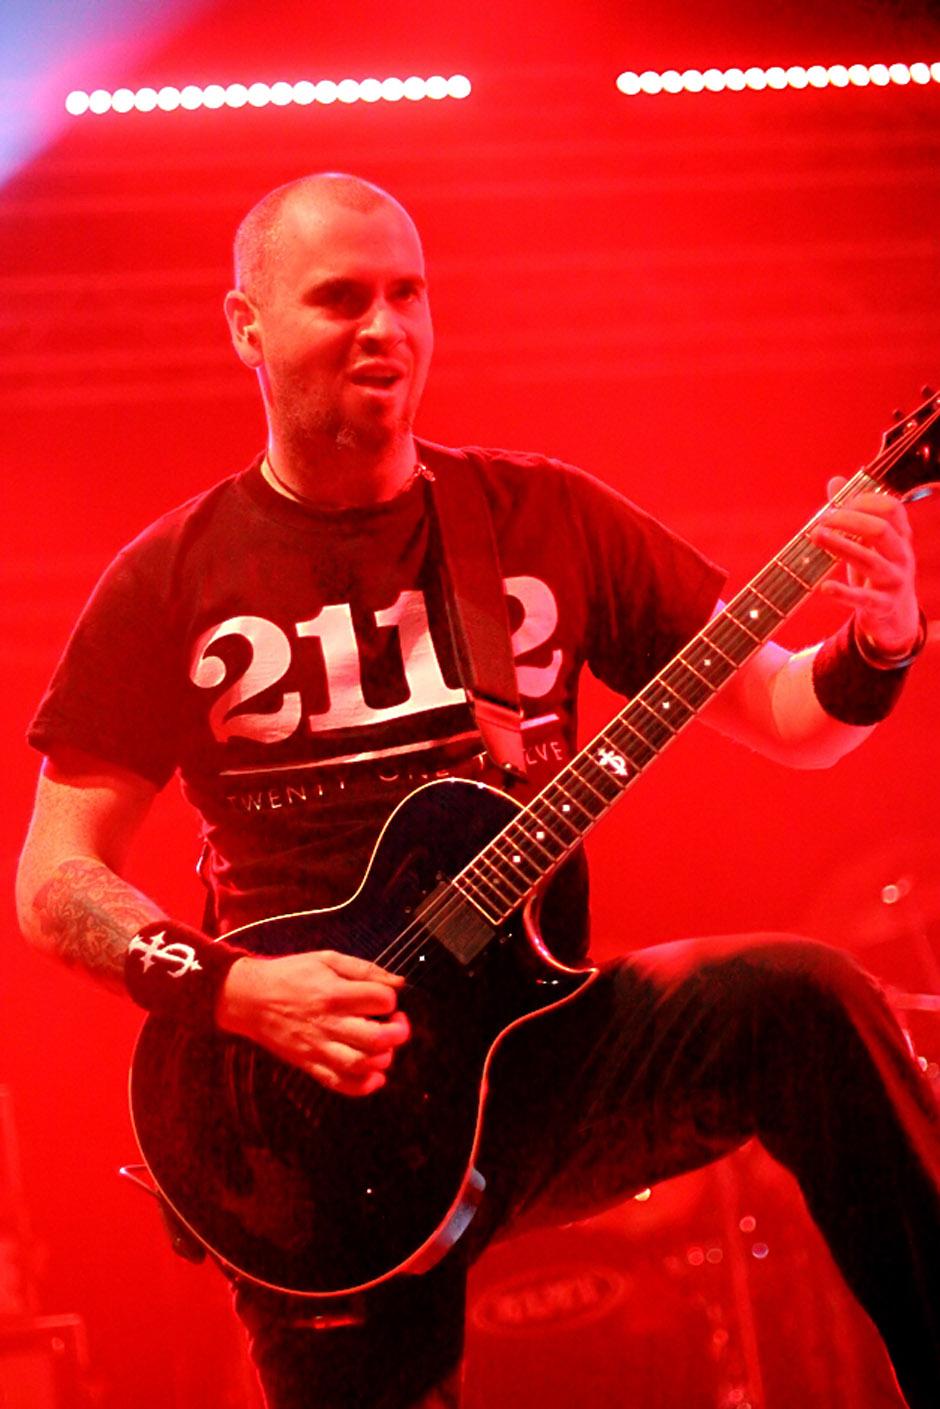 Devil Driver live, 22.02.2013, Geiselwind, Music Hall